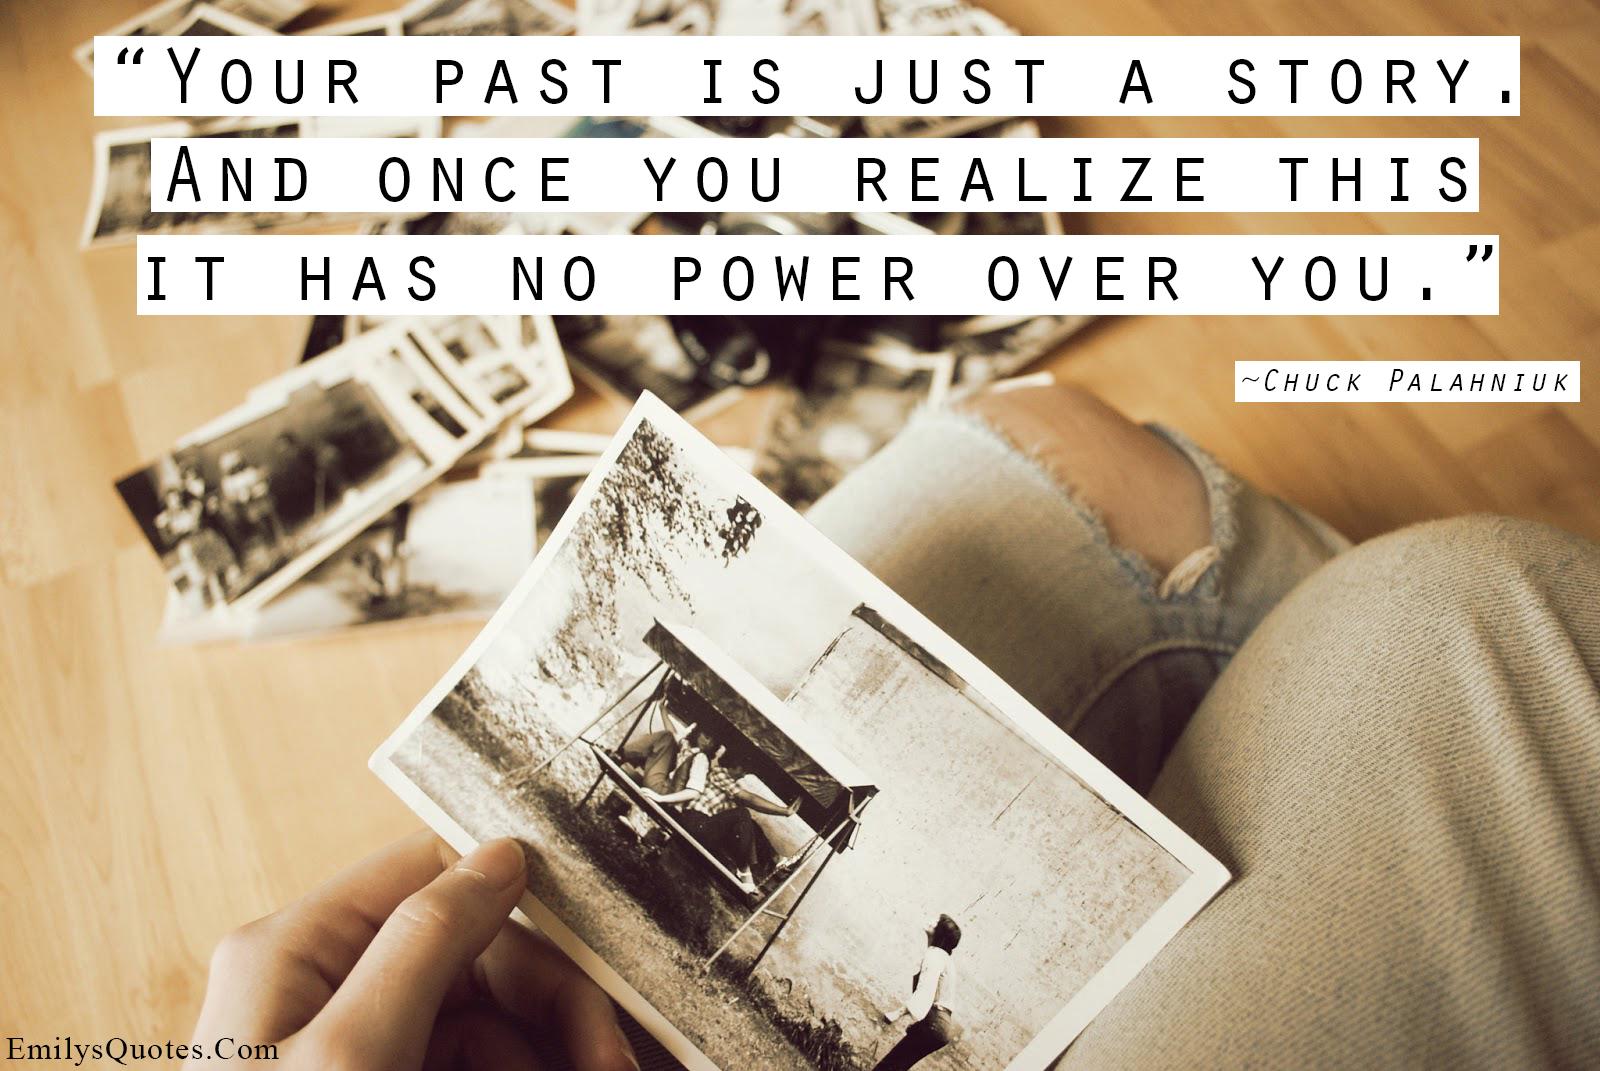 EmilysQuotes.Com - past, story, power, freedom, understanding, Chuck Palahniuk, choice